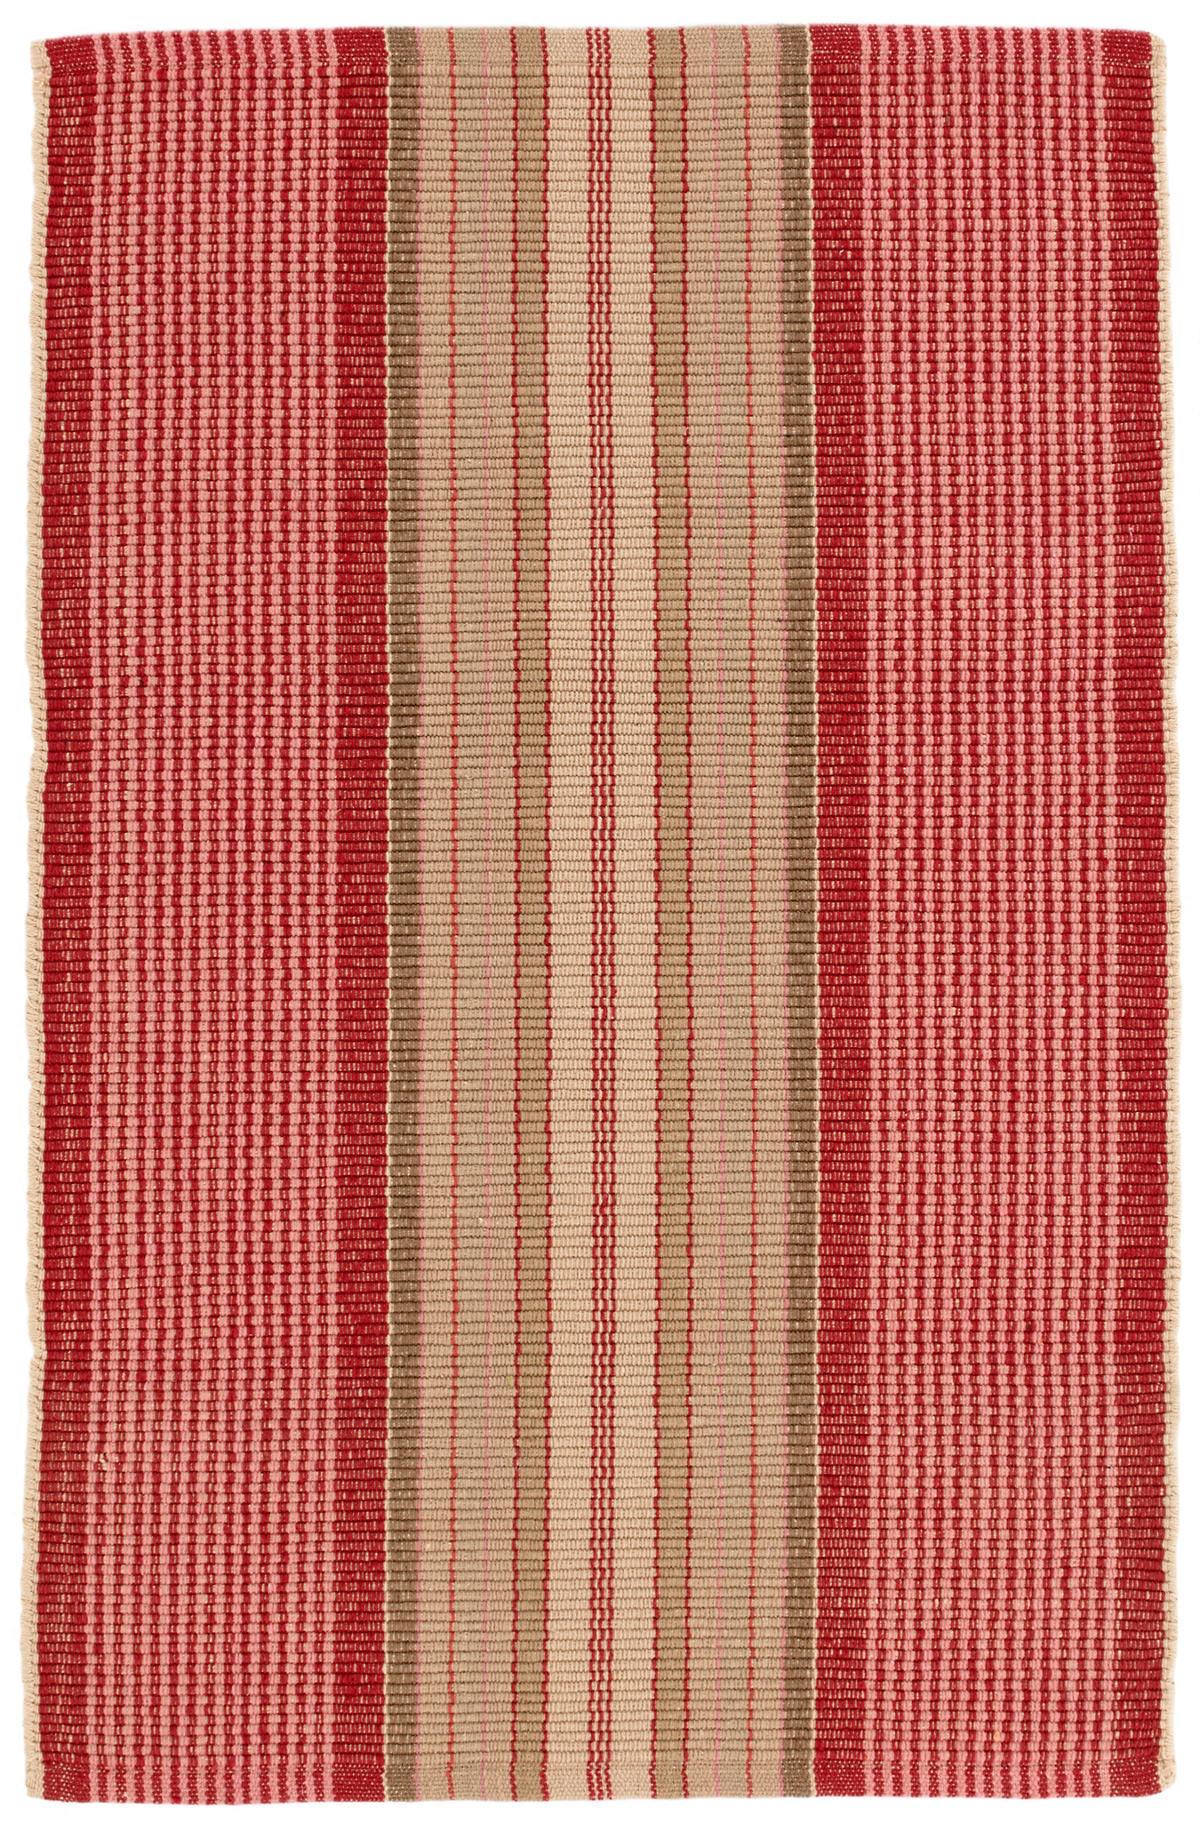 Framboise Woven Cotton Rug